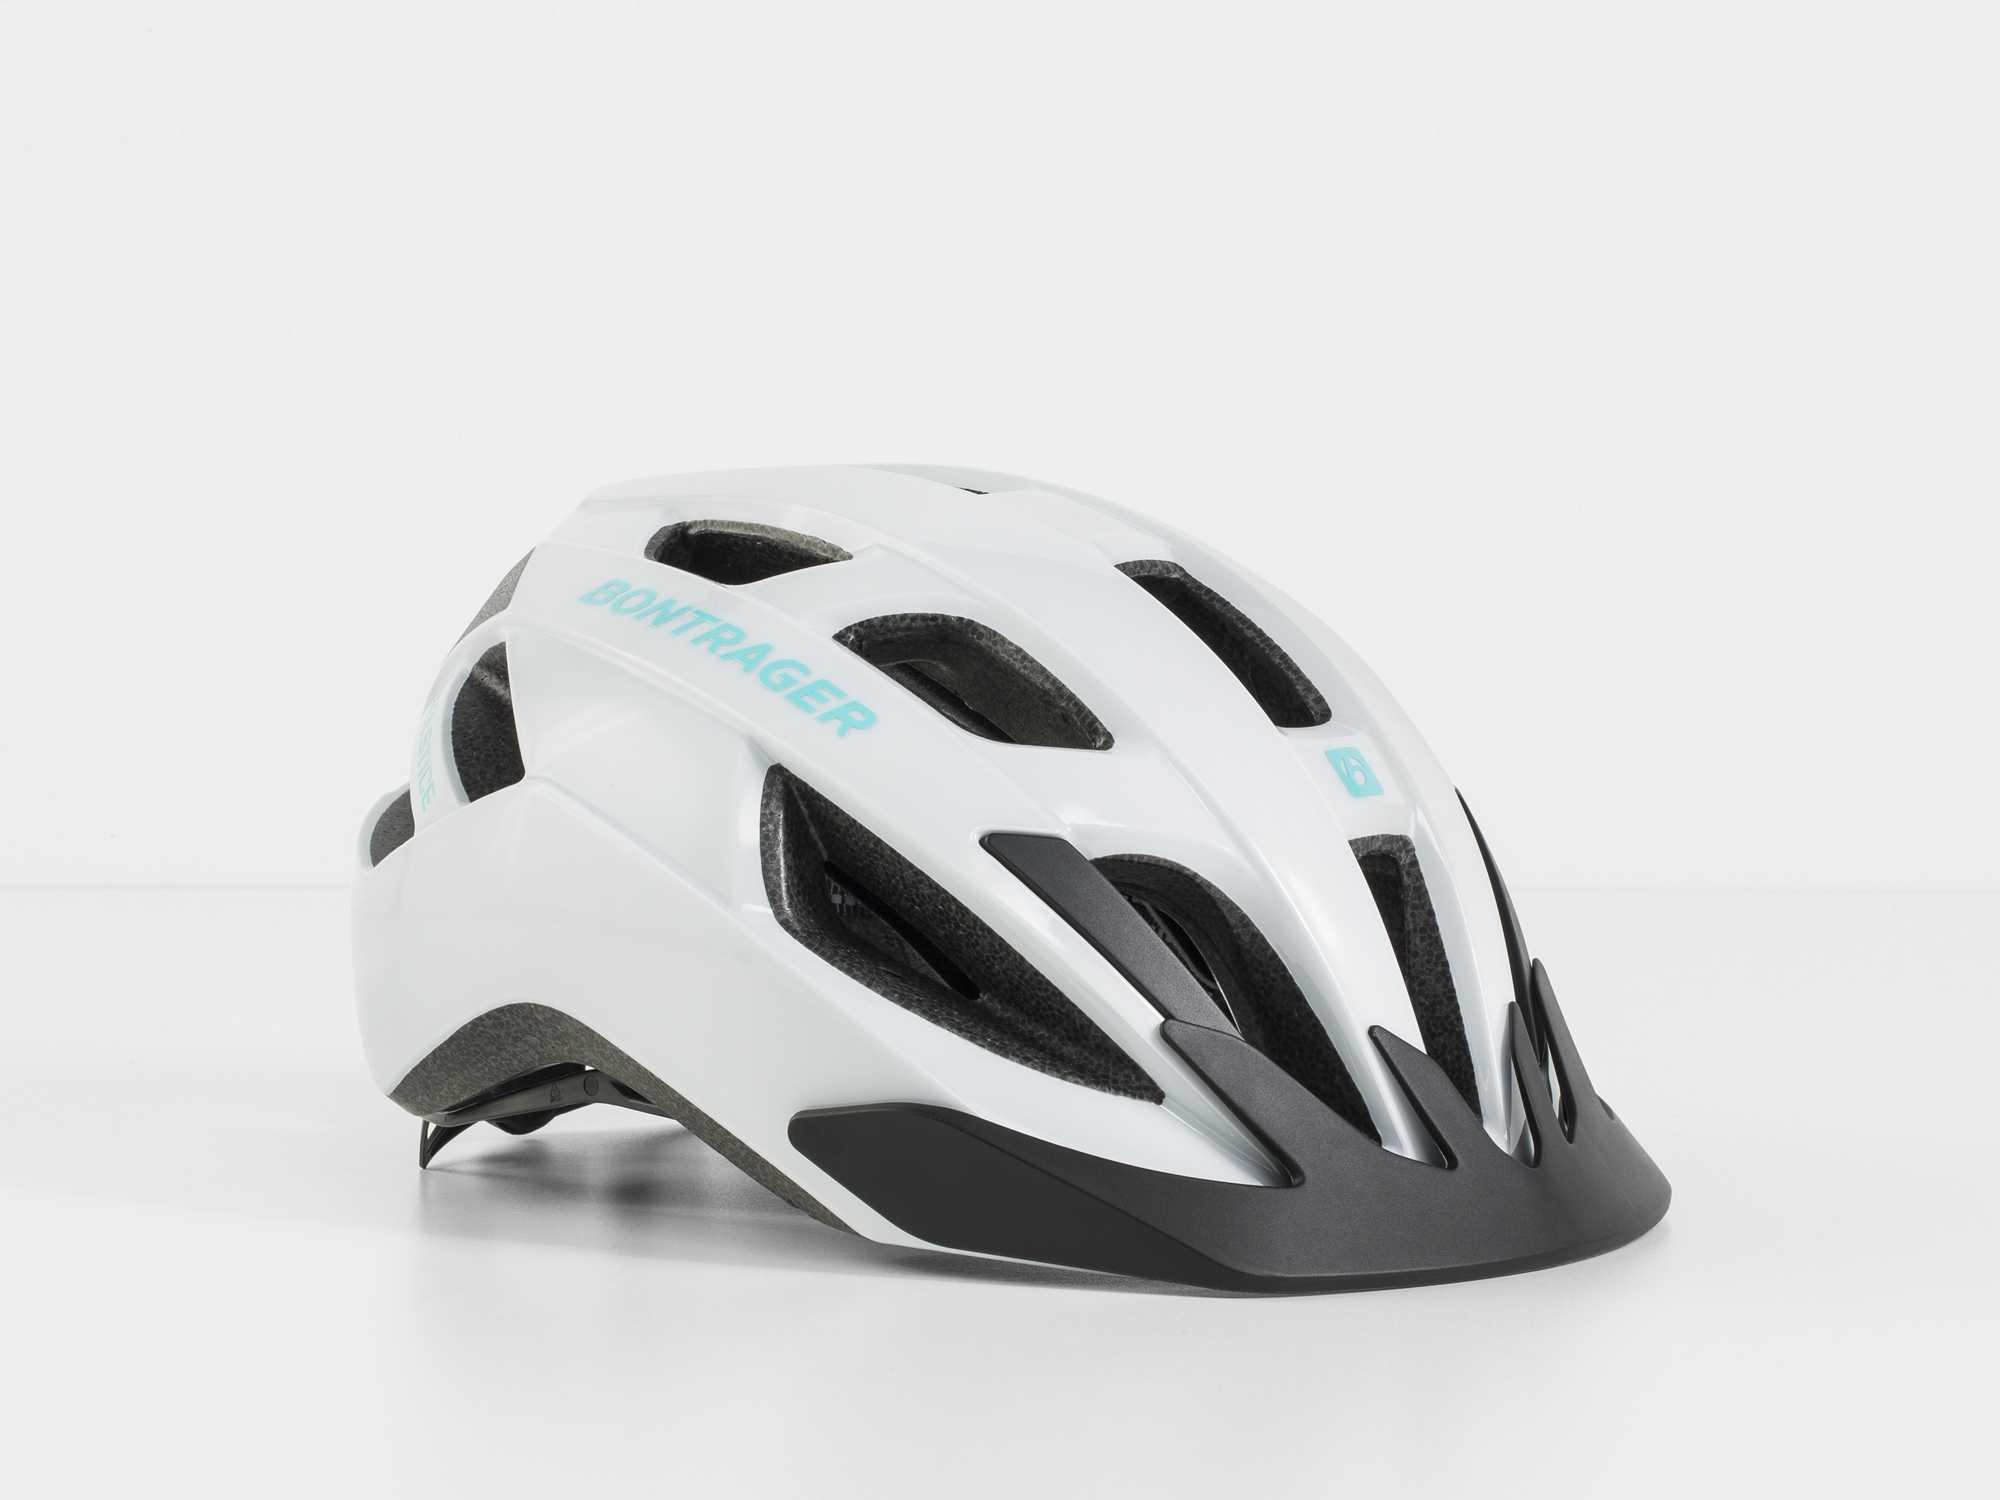 Hjälm Bontrager Solstice vit/grön | Helmets